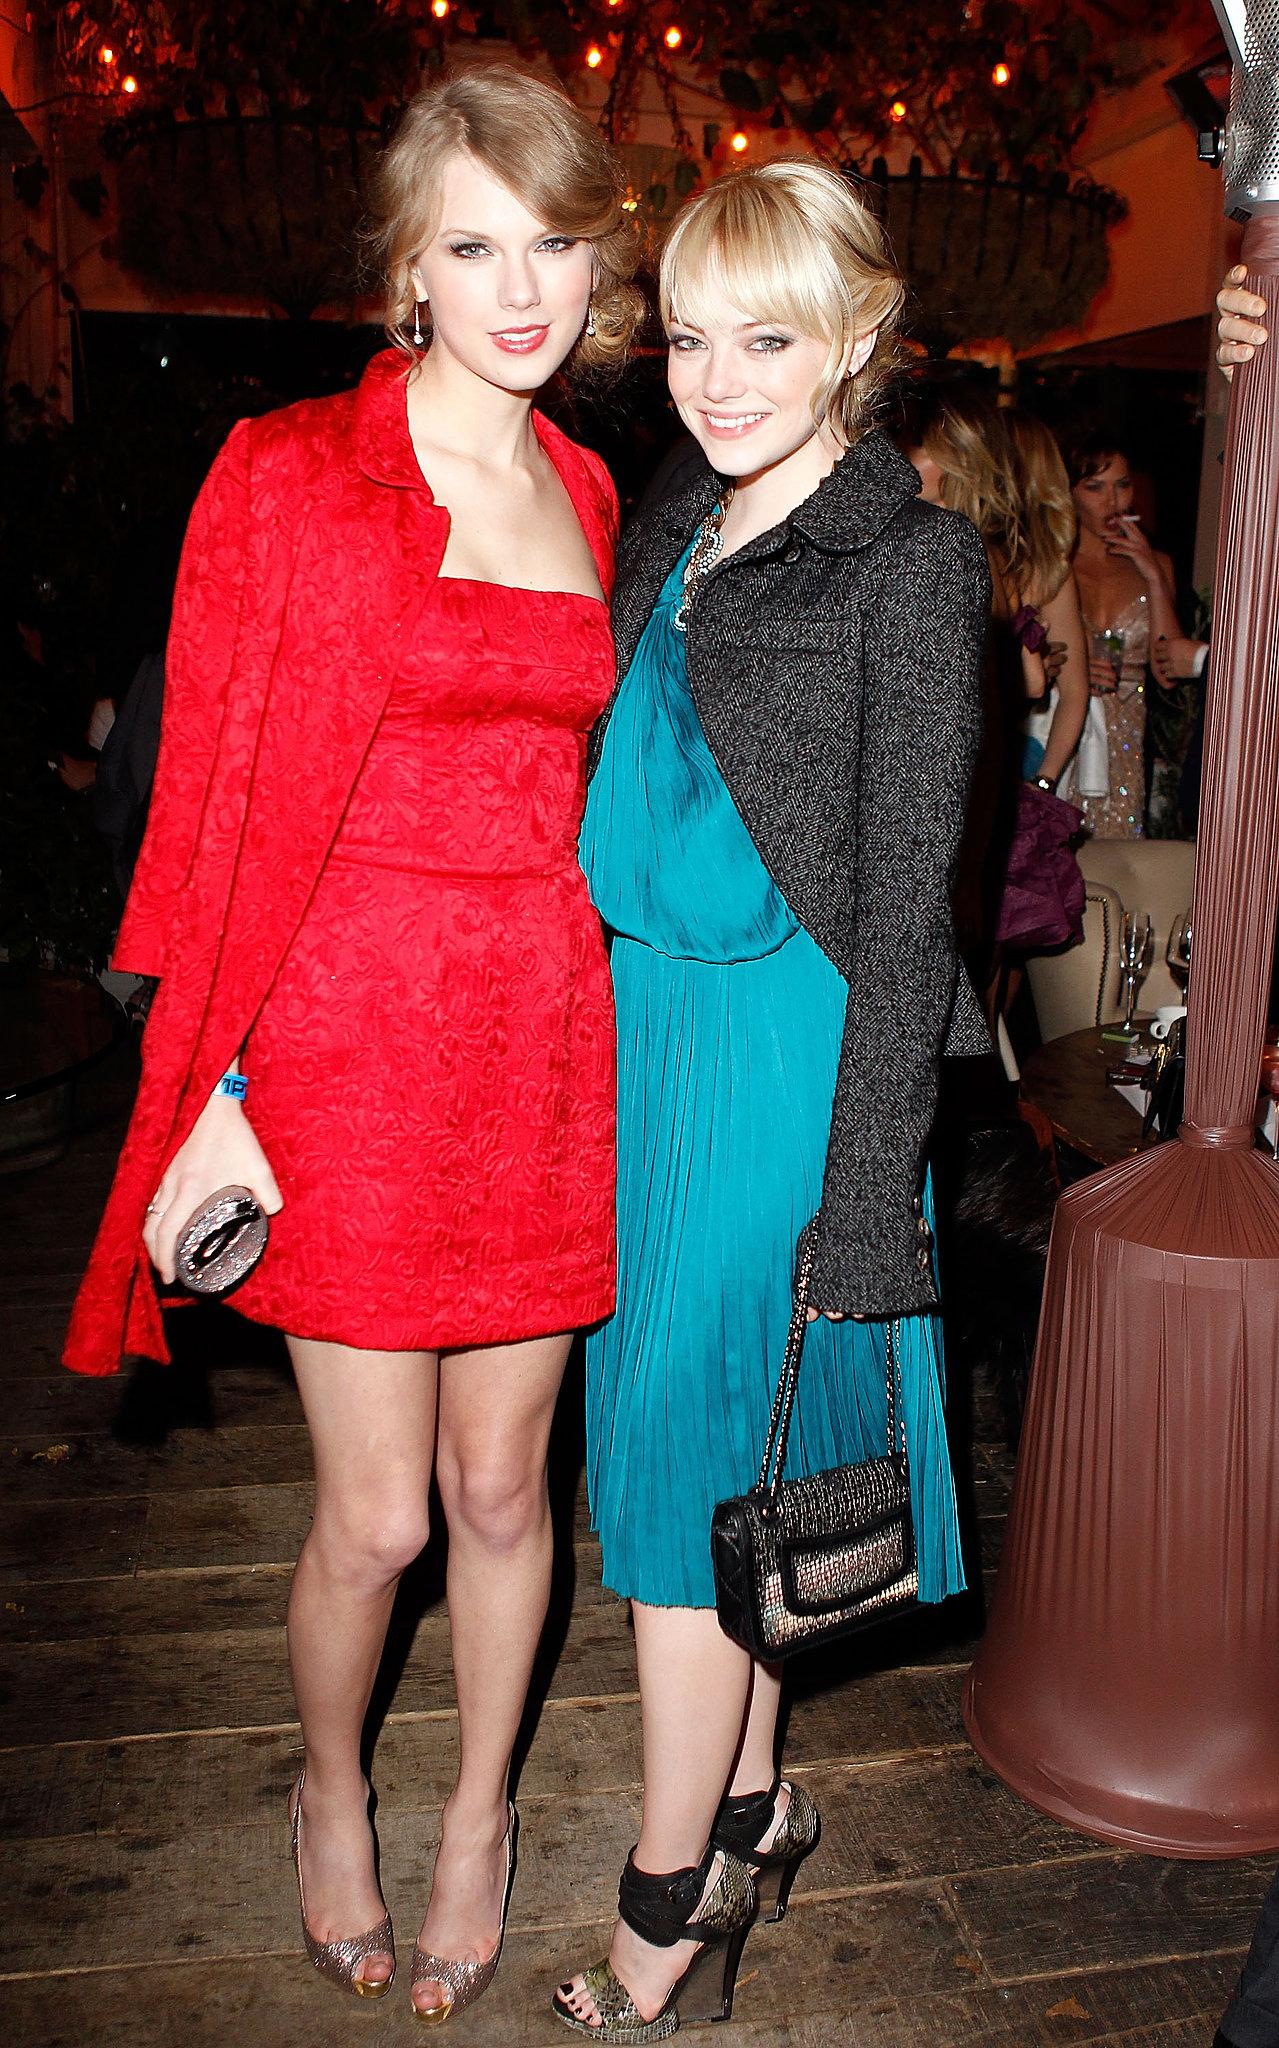 Taylor Swift and Emma Stone